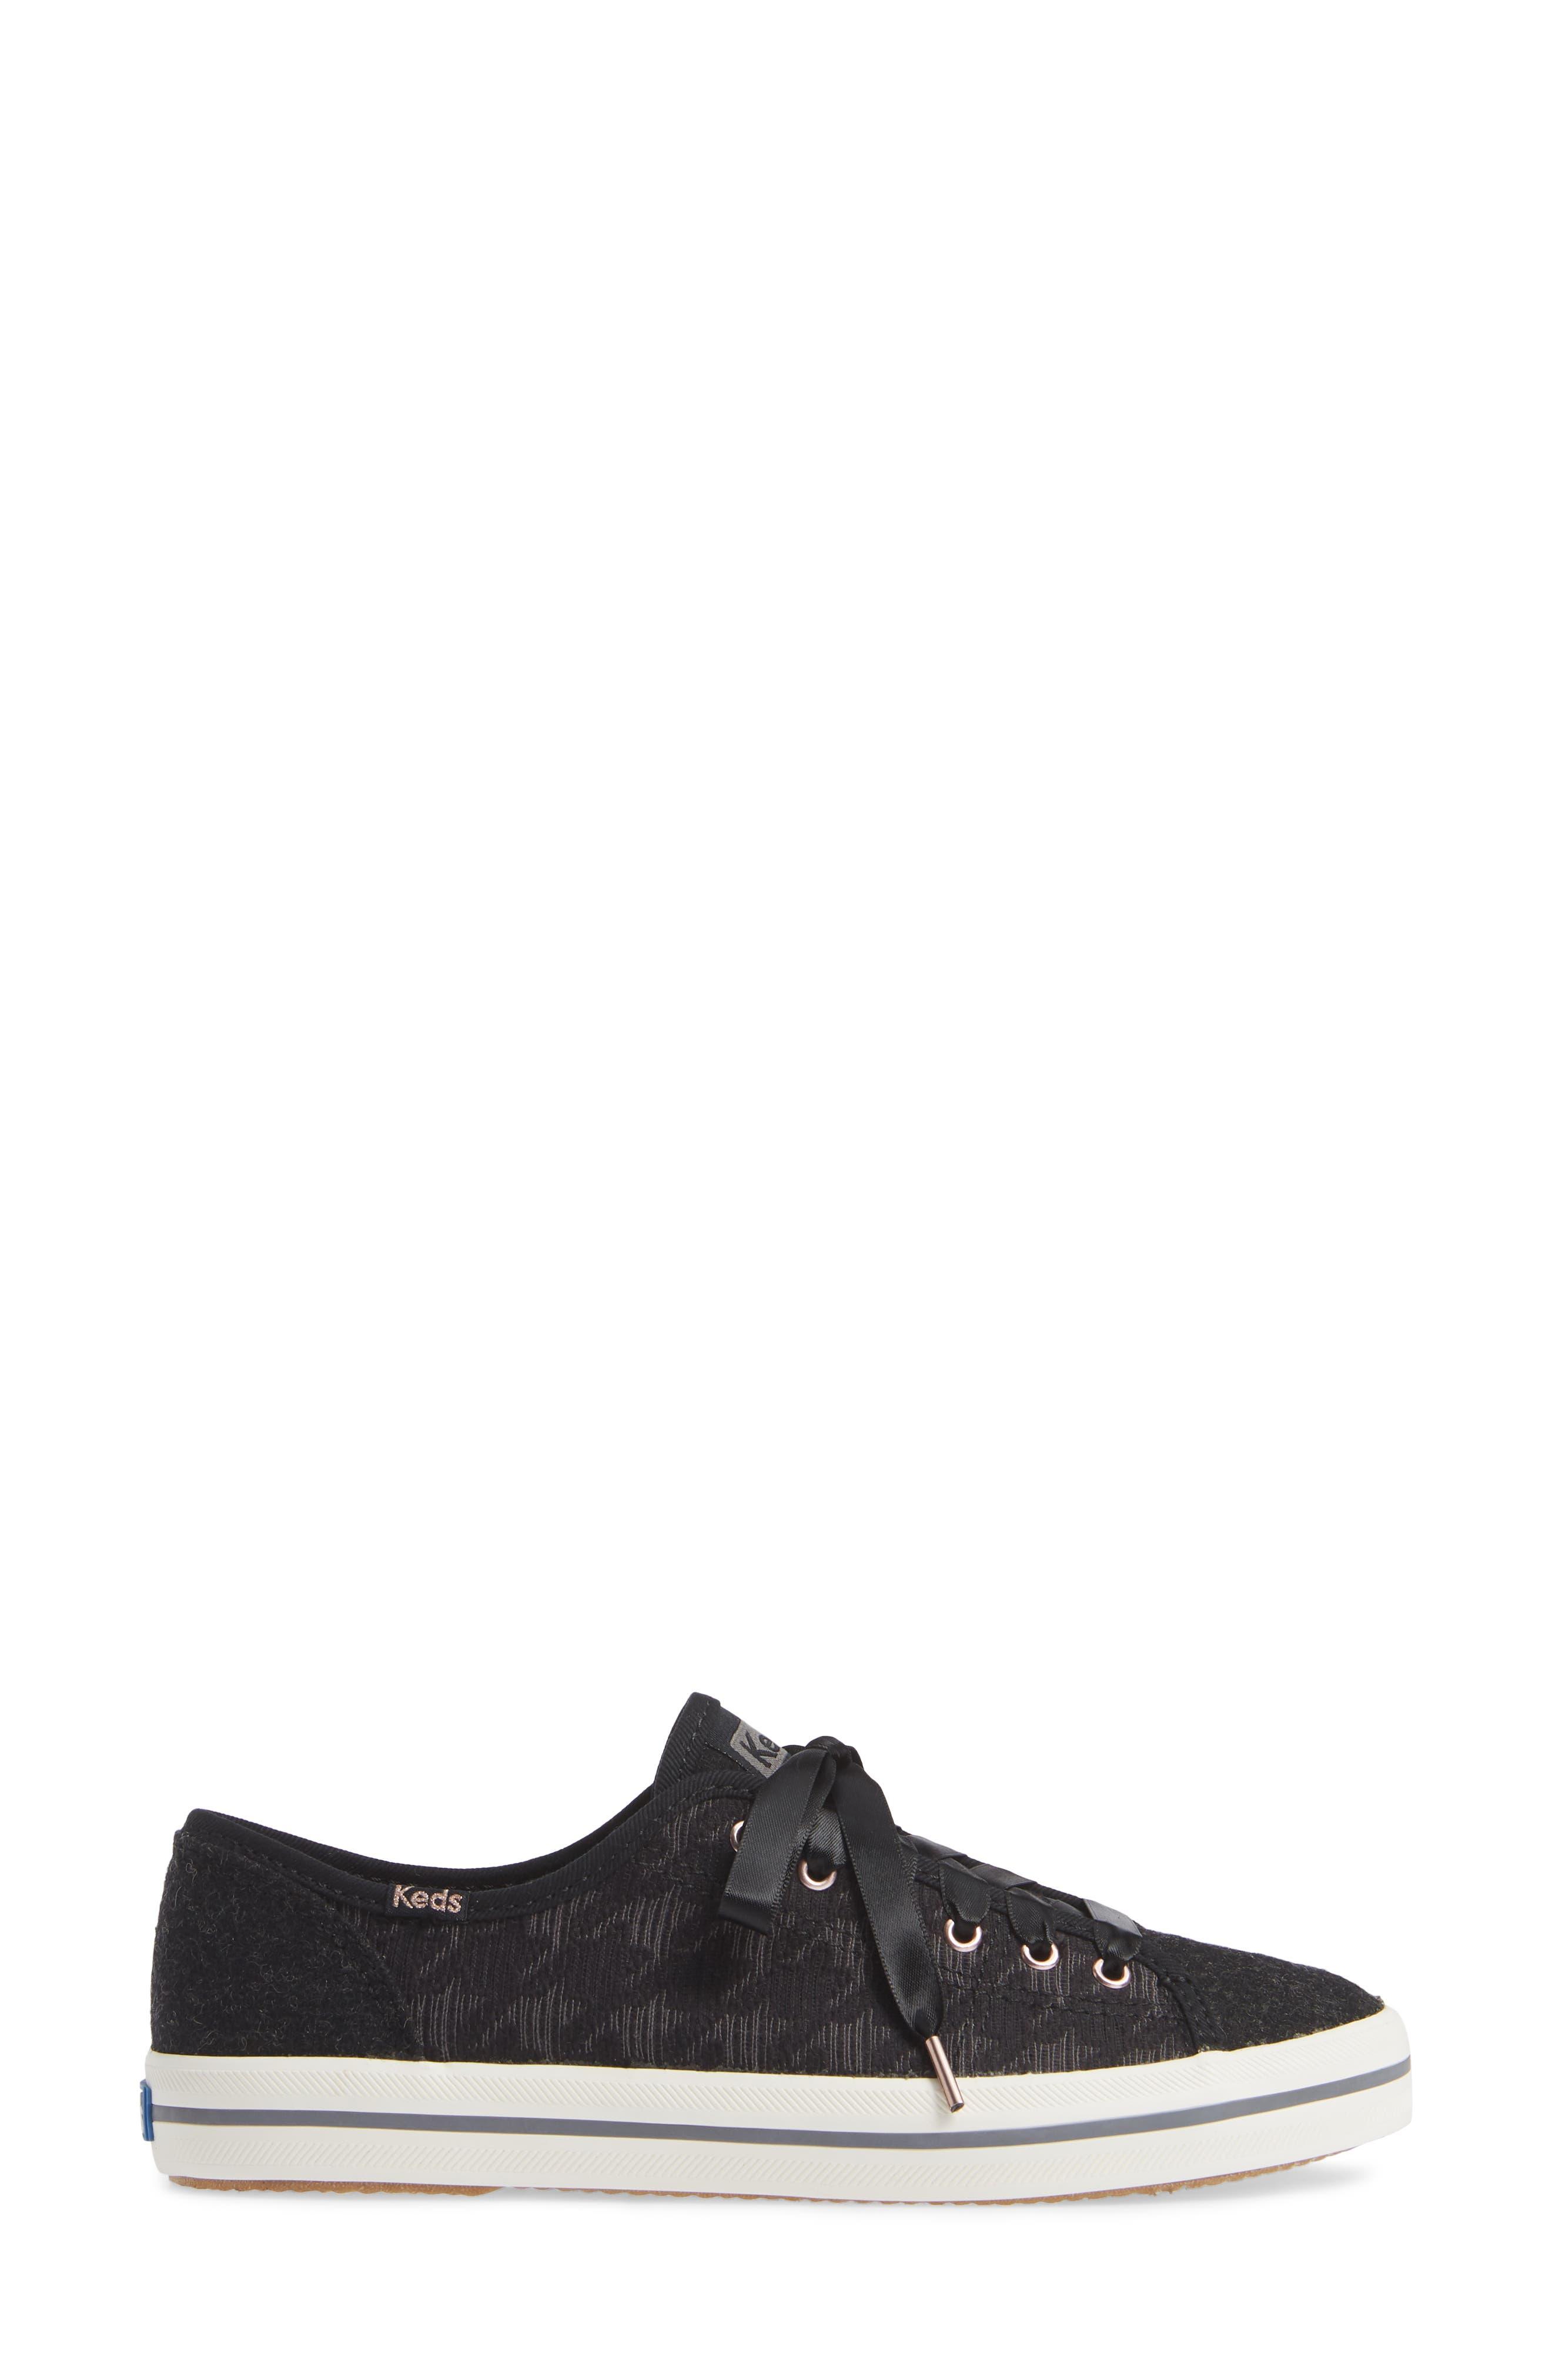 KEDS<SUP>®</SUP>, Kickstart Sneaker, Alternate thumbnail 3, color, BLACK HOUNDSTOOTH